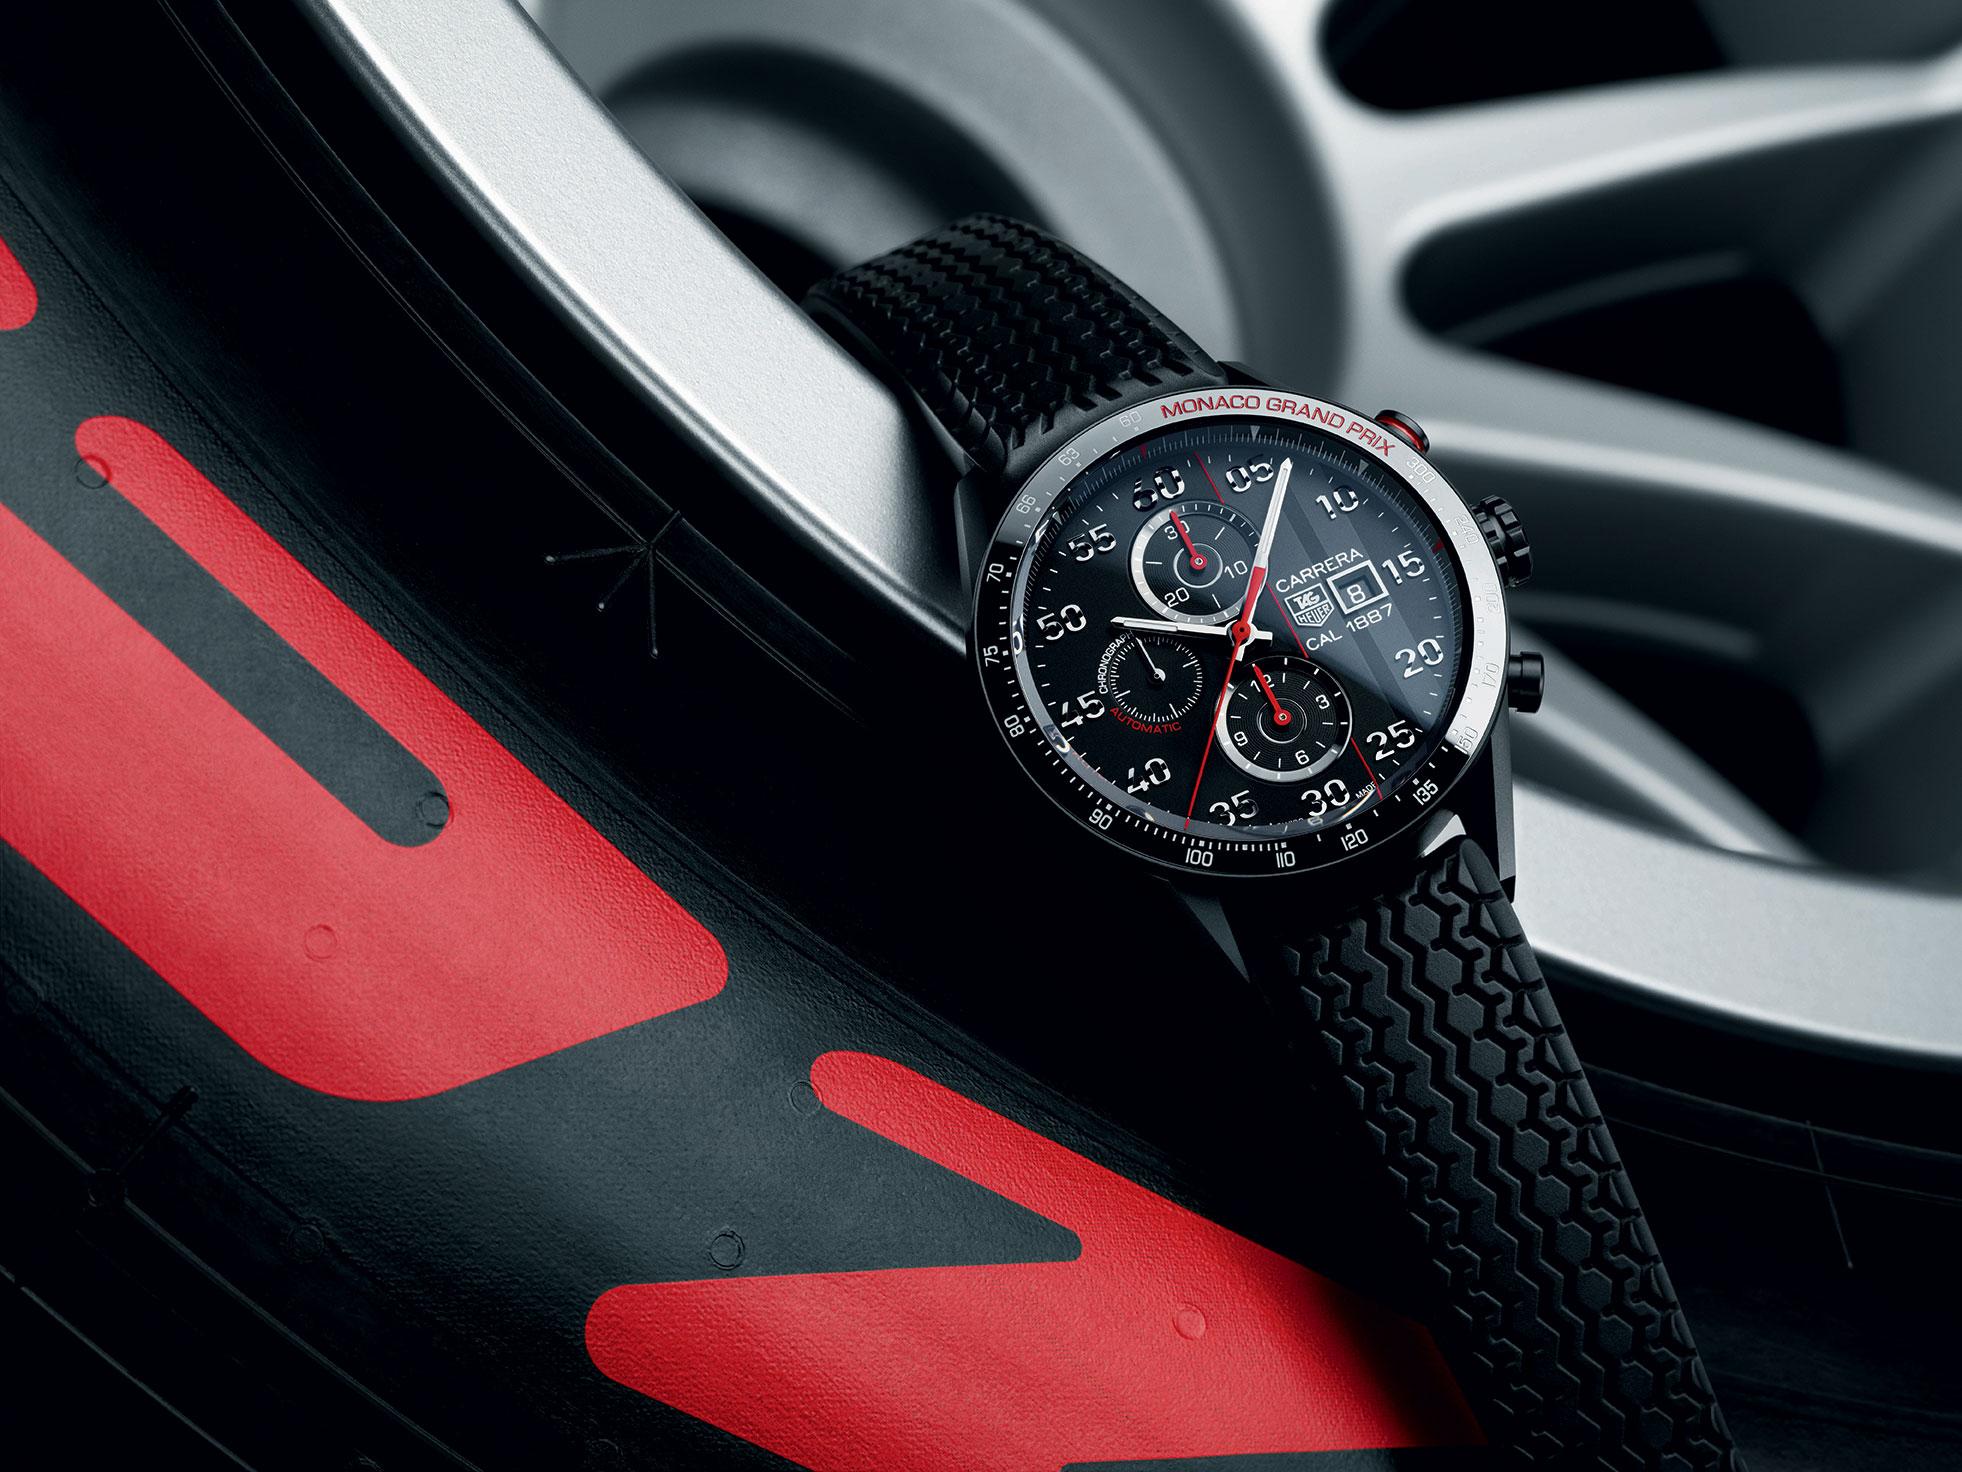 Naziv: 2014-TAG-Heuer-Carrera-1887-Monaco-Grand-Prix-Edition-watches-satovi-2.jpg, pregleda: 668, veličina: 426,7 KB